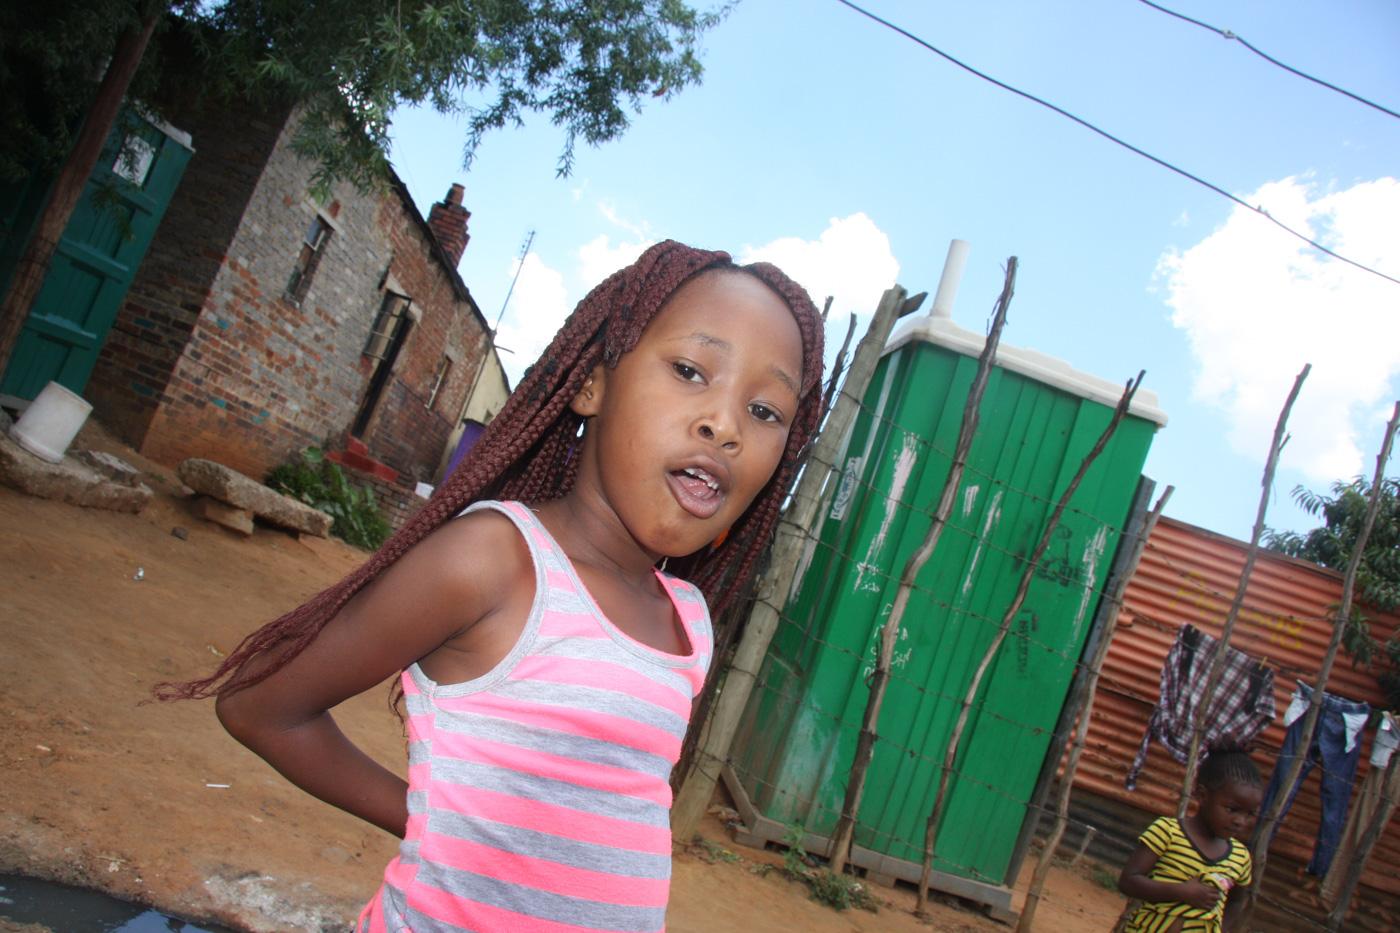 renee-lusano-soweto-1.jpg